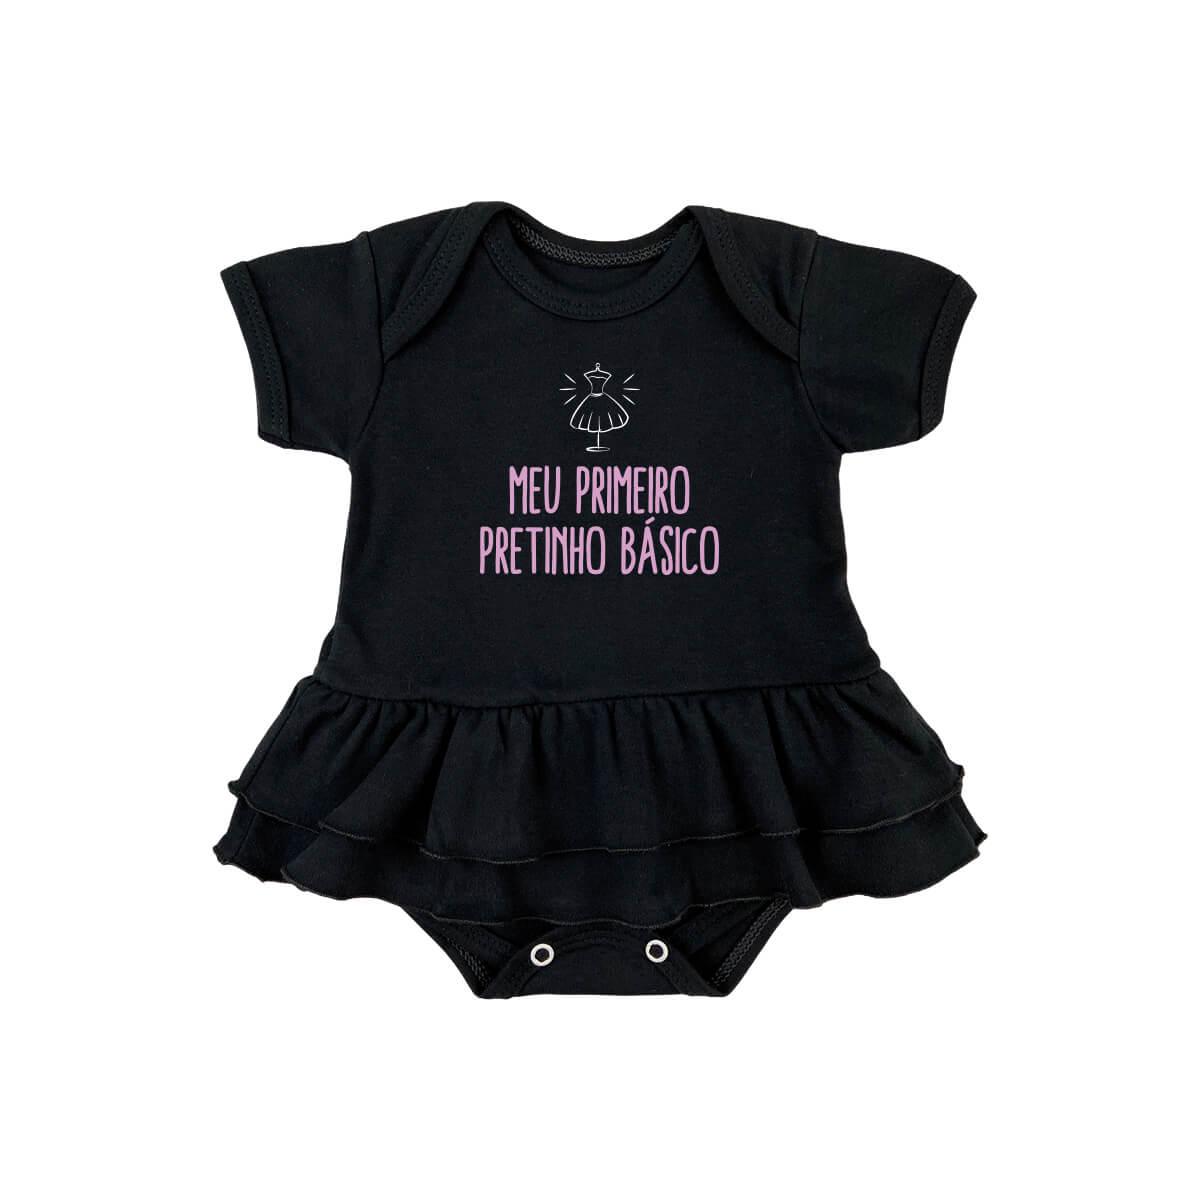 Body Bebê Saia Pretinho Básico Suedine 100% Algodão